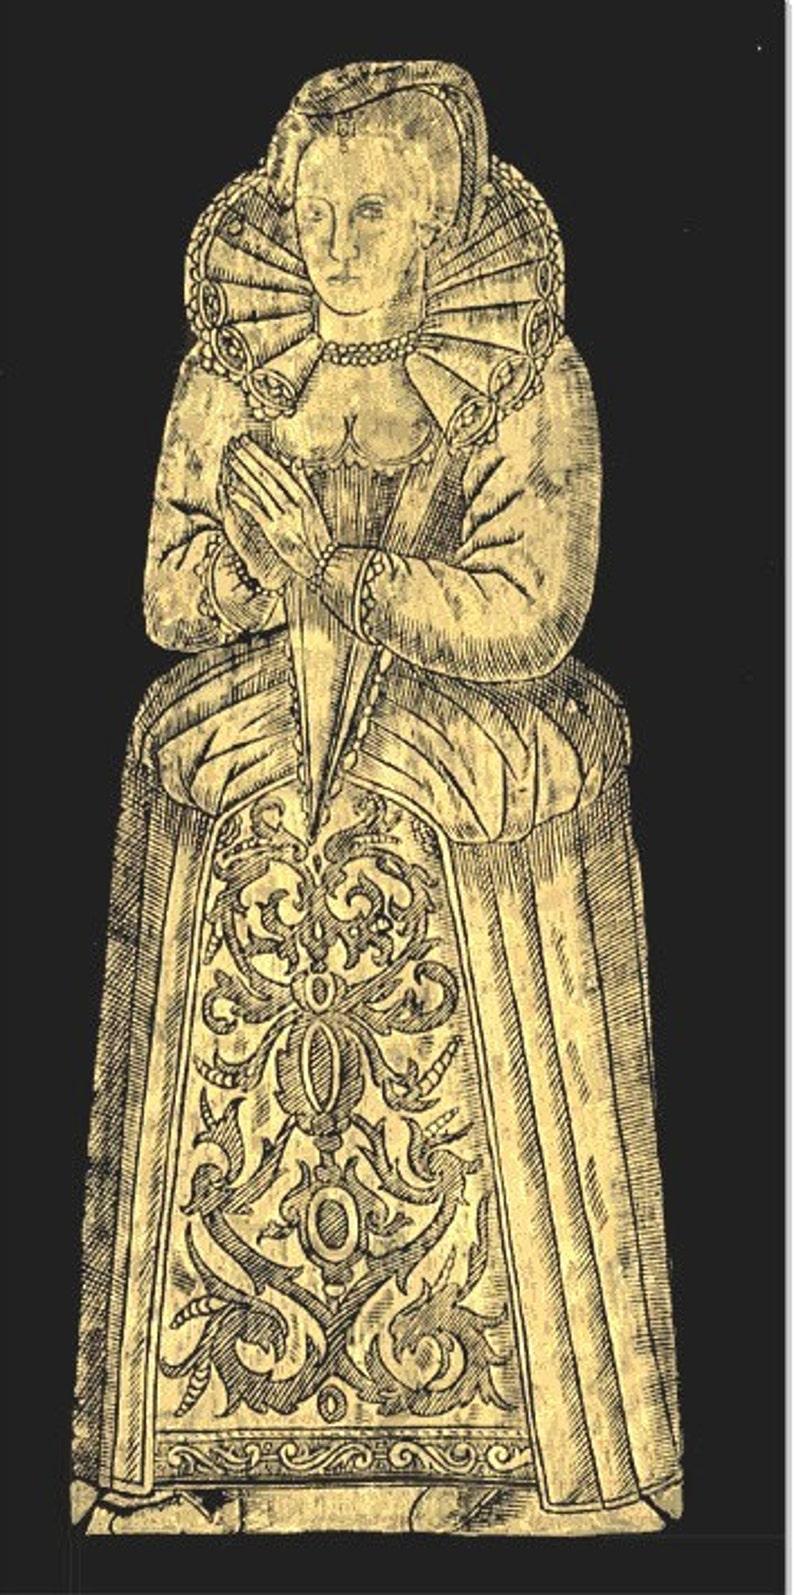 Dame Radcliff Wingfeld Medieval Art Renaissance Art Grave Rubbing Handmade Brass Rubbing